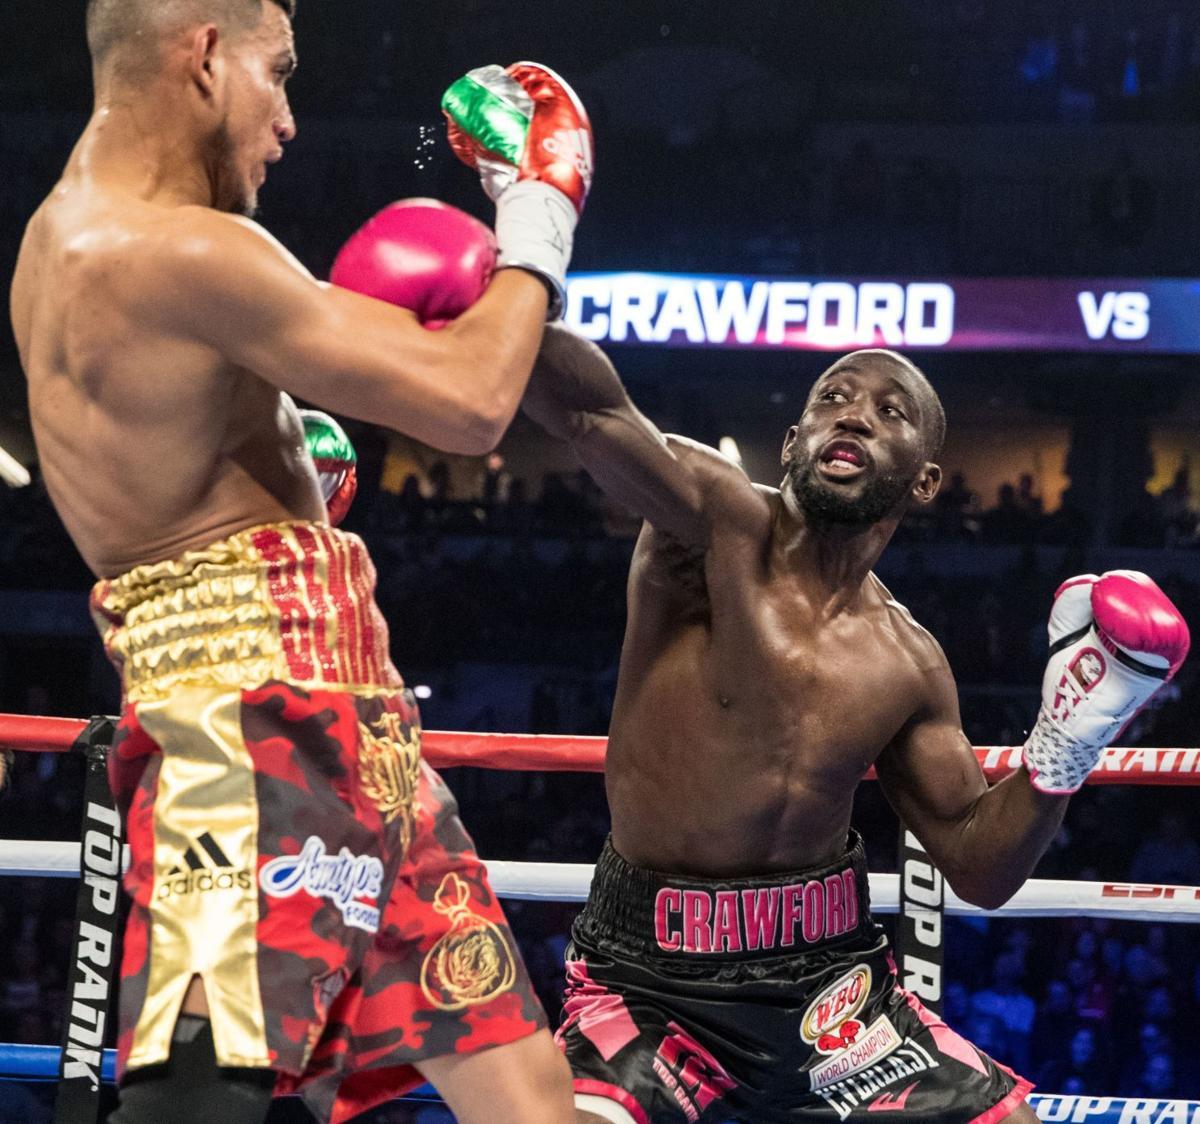 Crawford wins